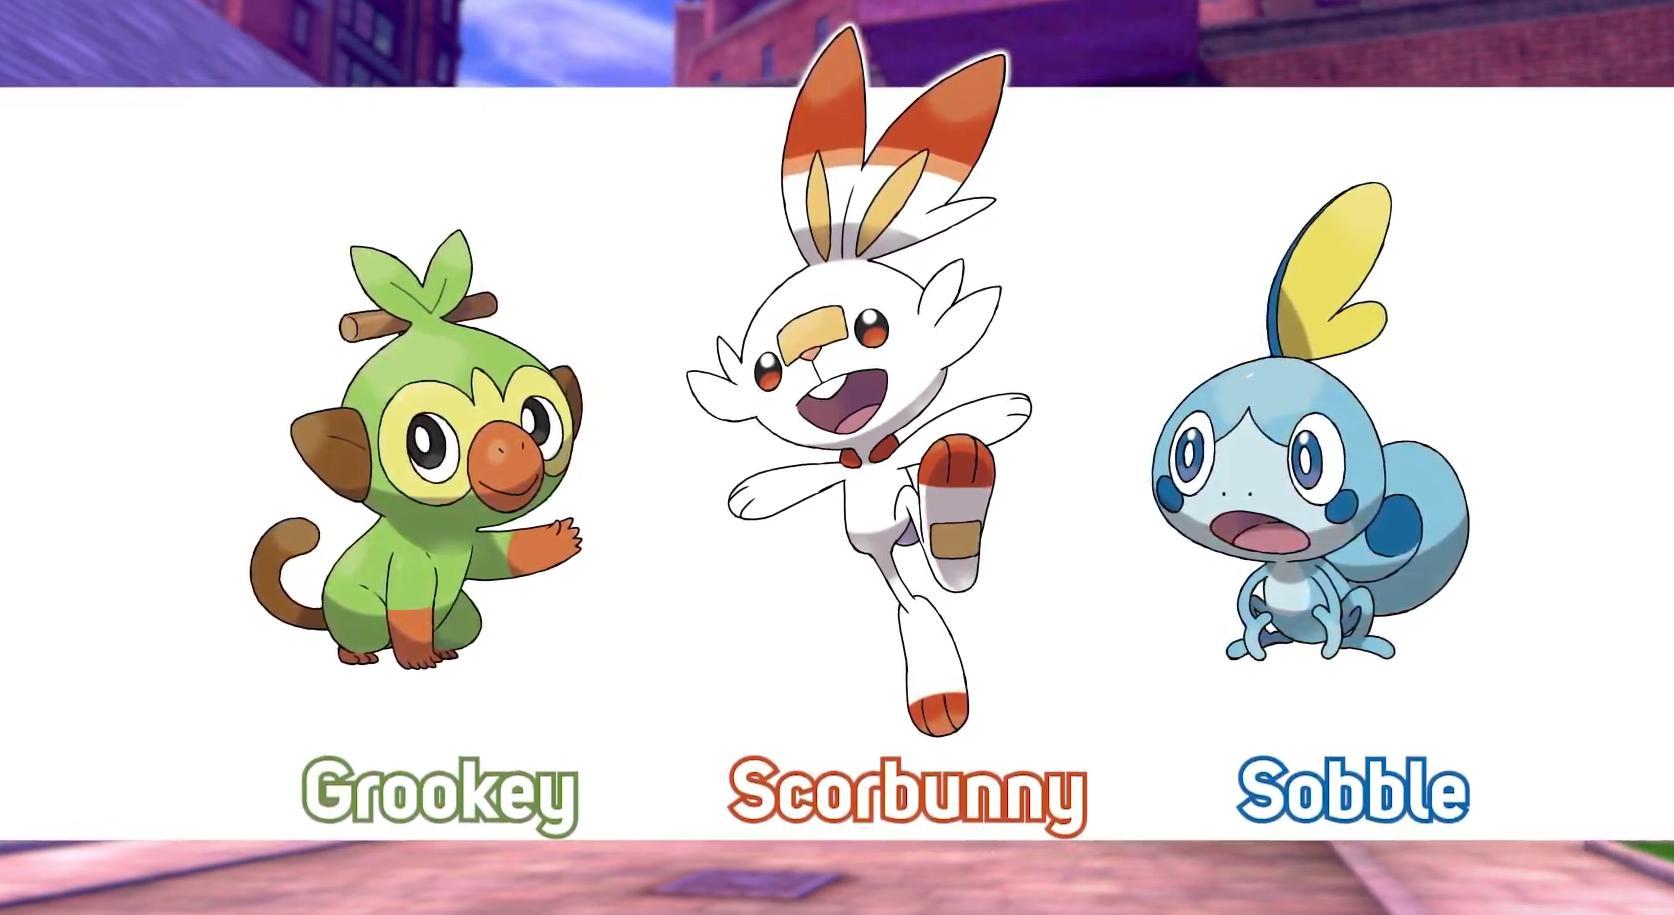 Pokemon Sword and Shield starter Pokemon